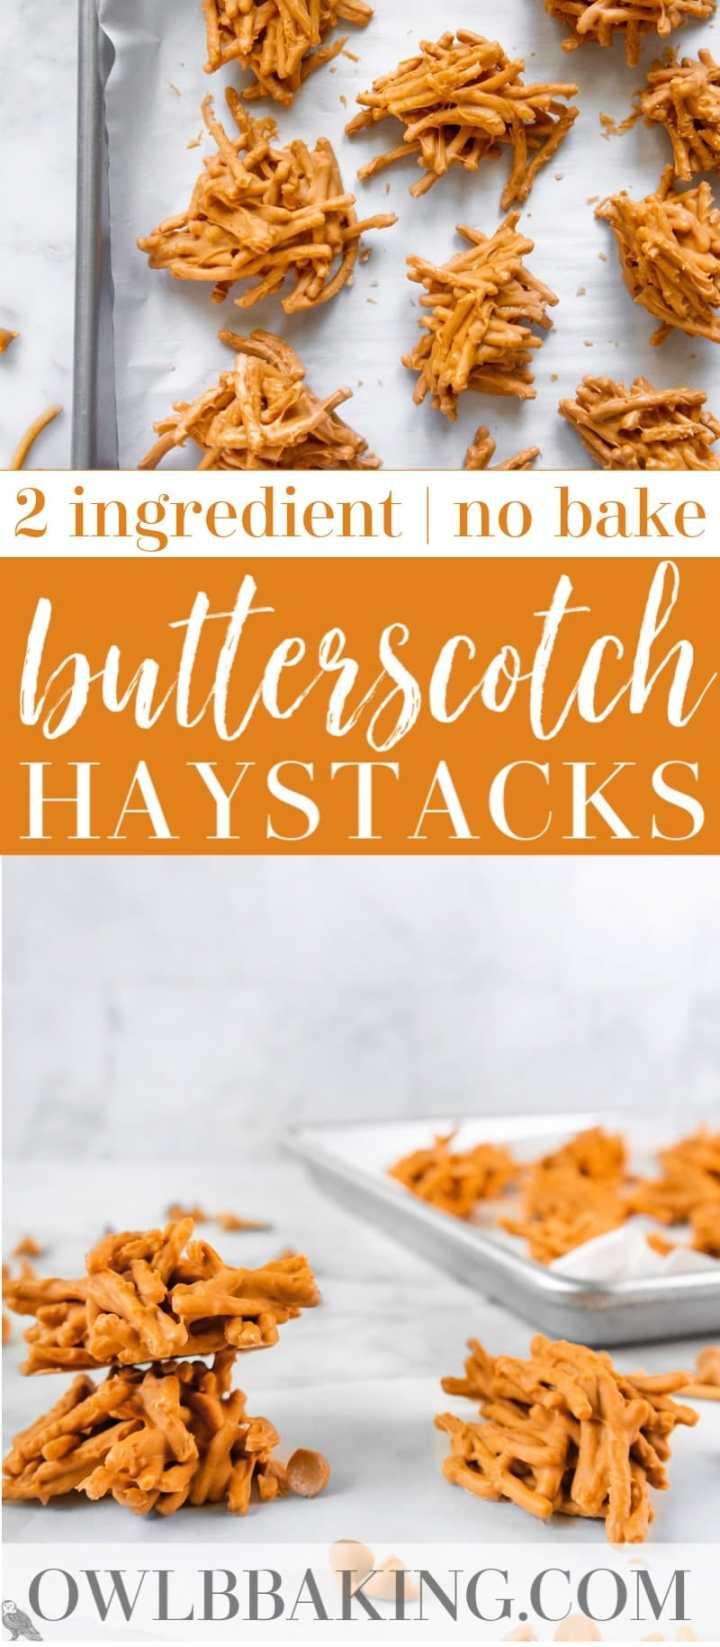 Butterscotch Haystacks